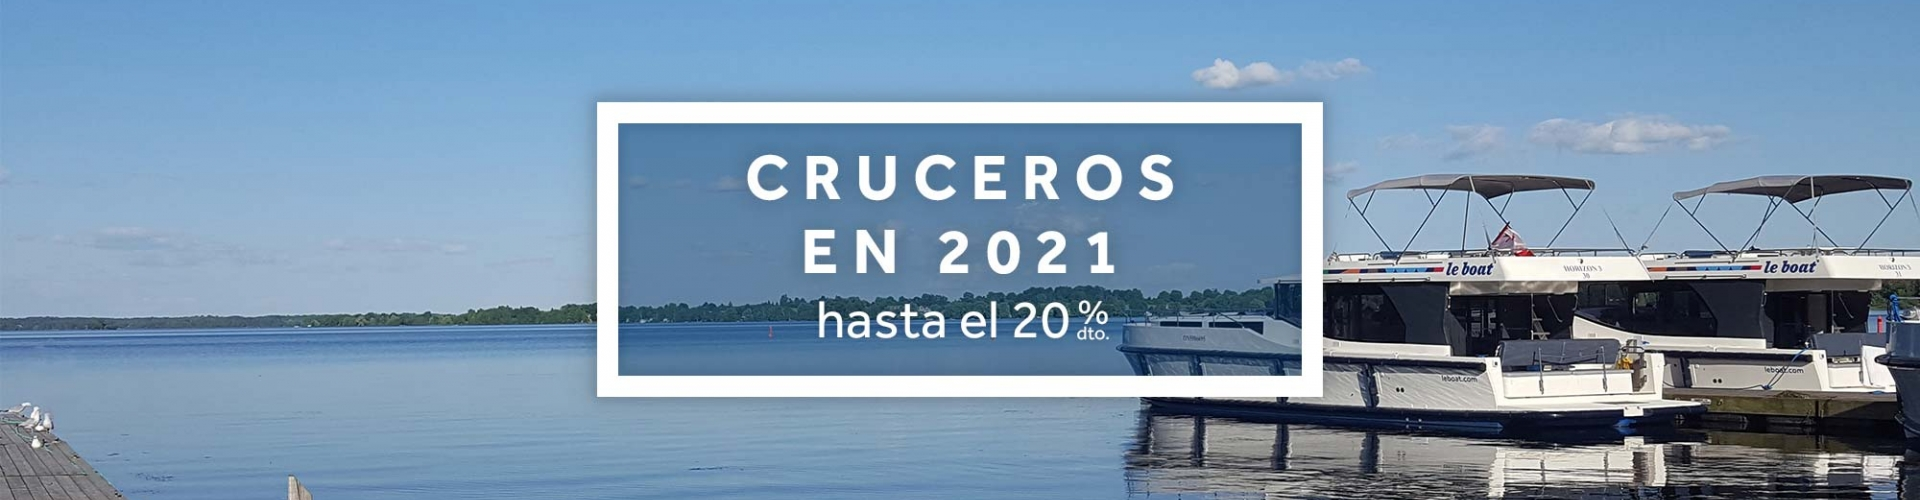 Cruceros 2021 en barco